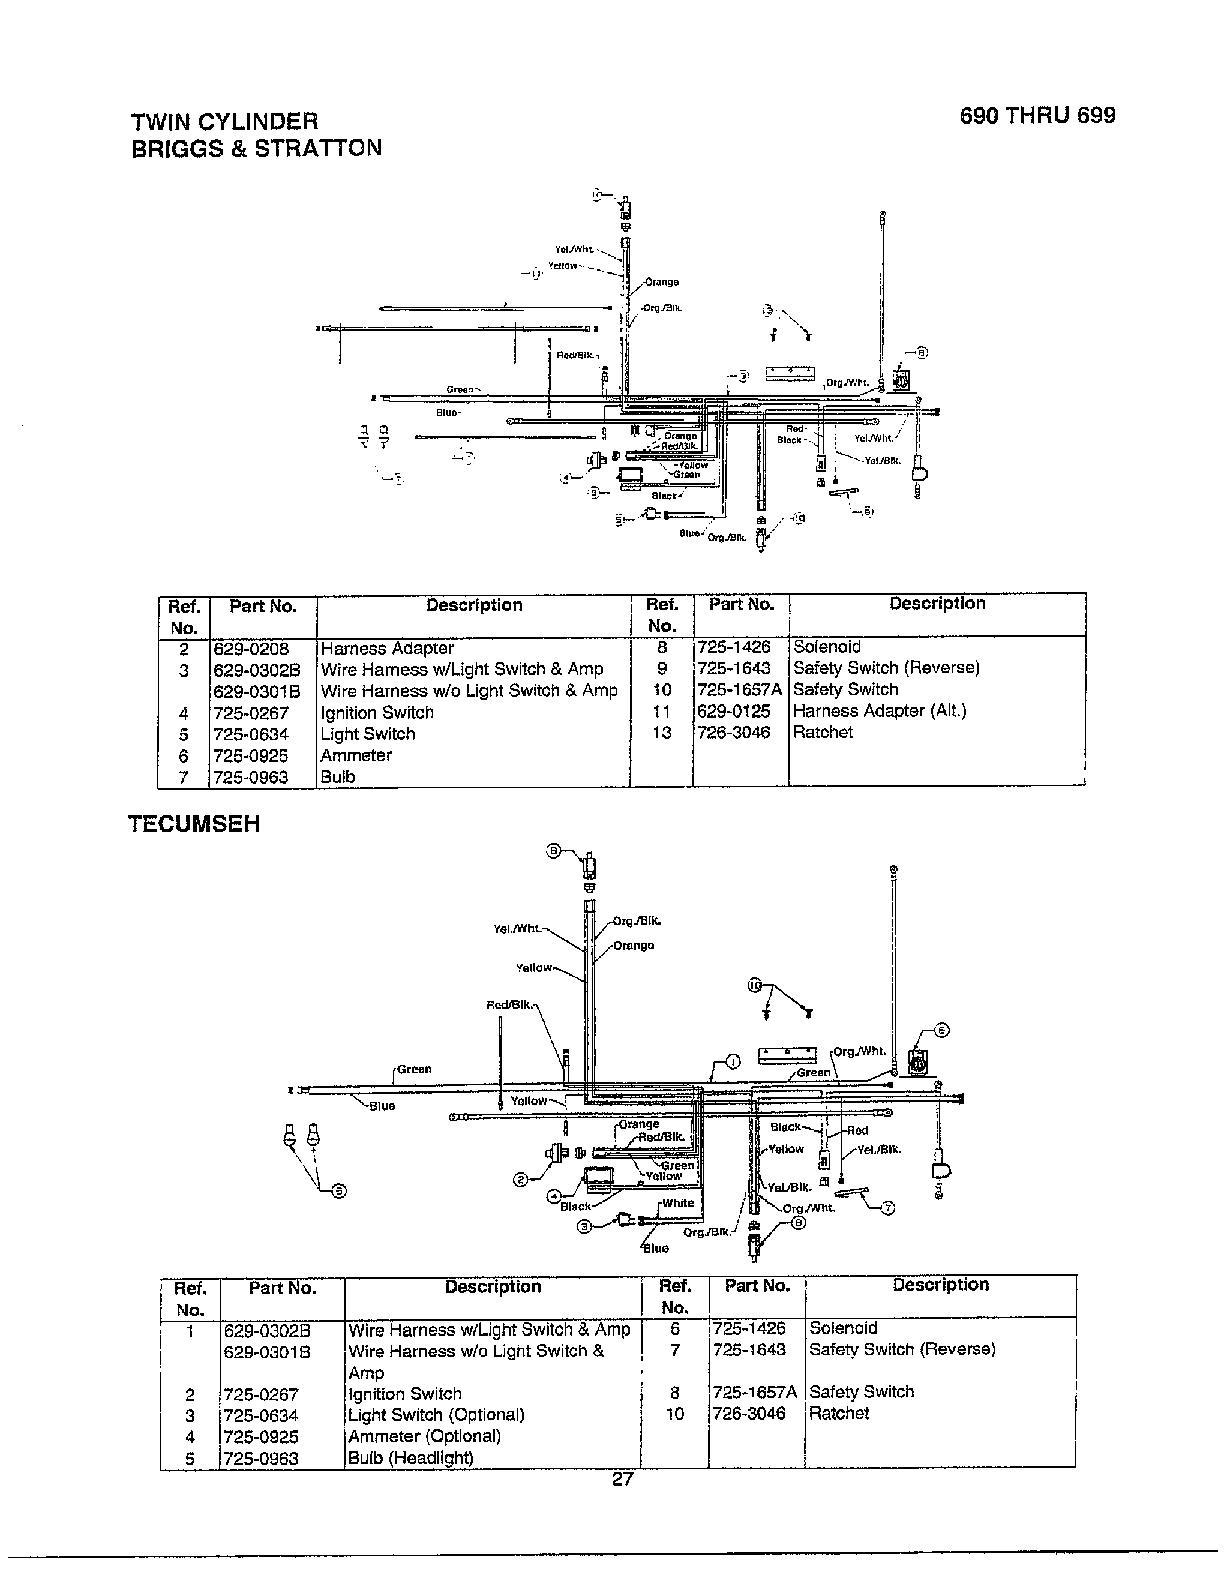 hight resolution of mtd 690 thru 699 electrical twin cylinder tecumseh diagram